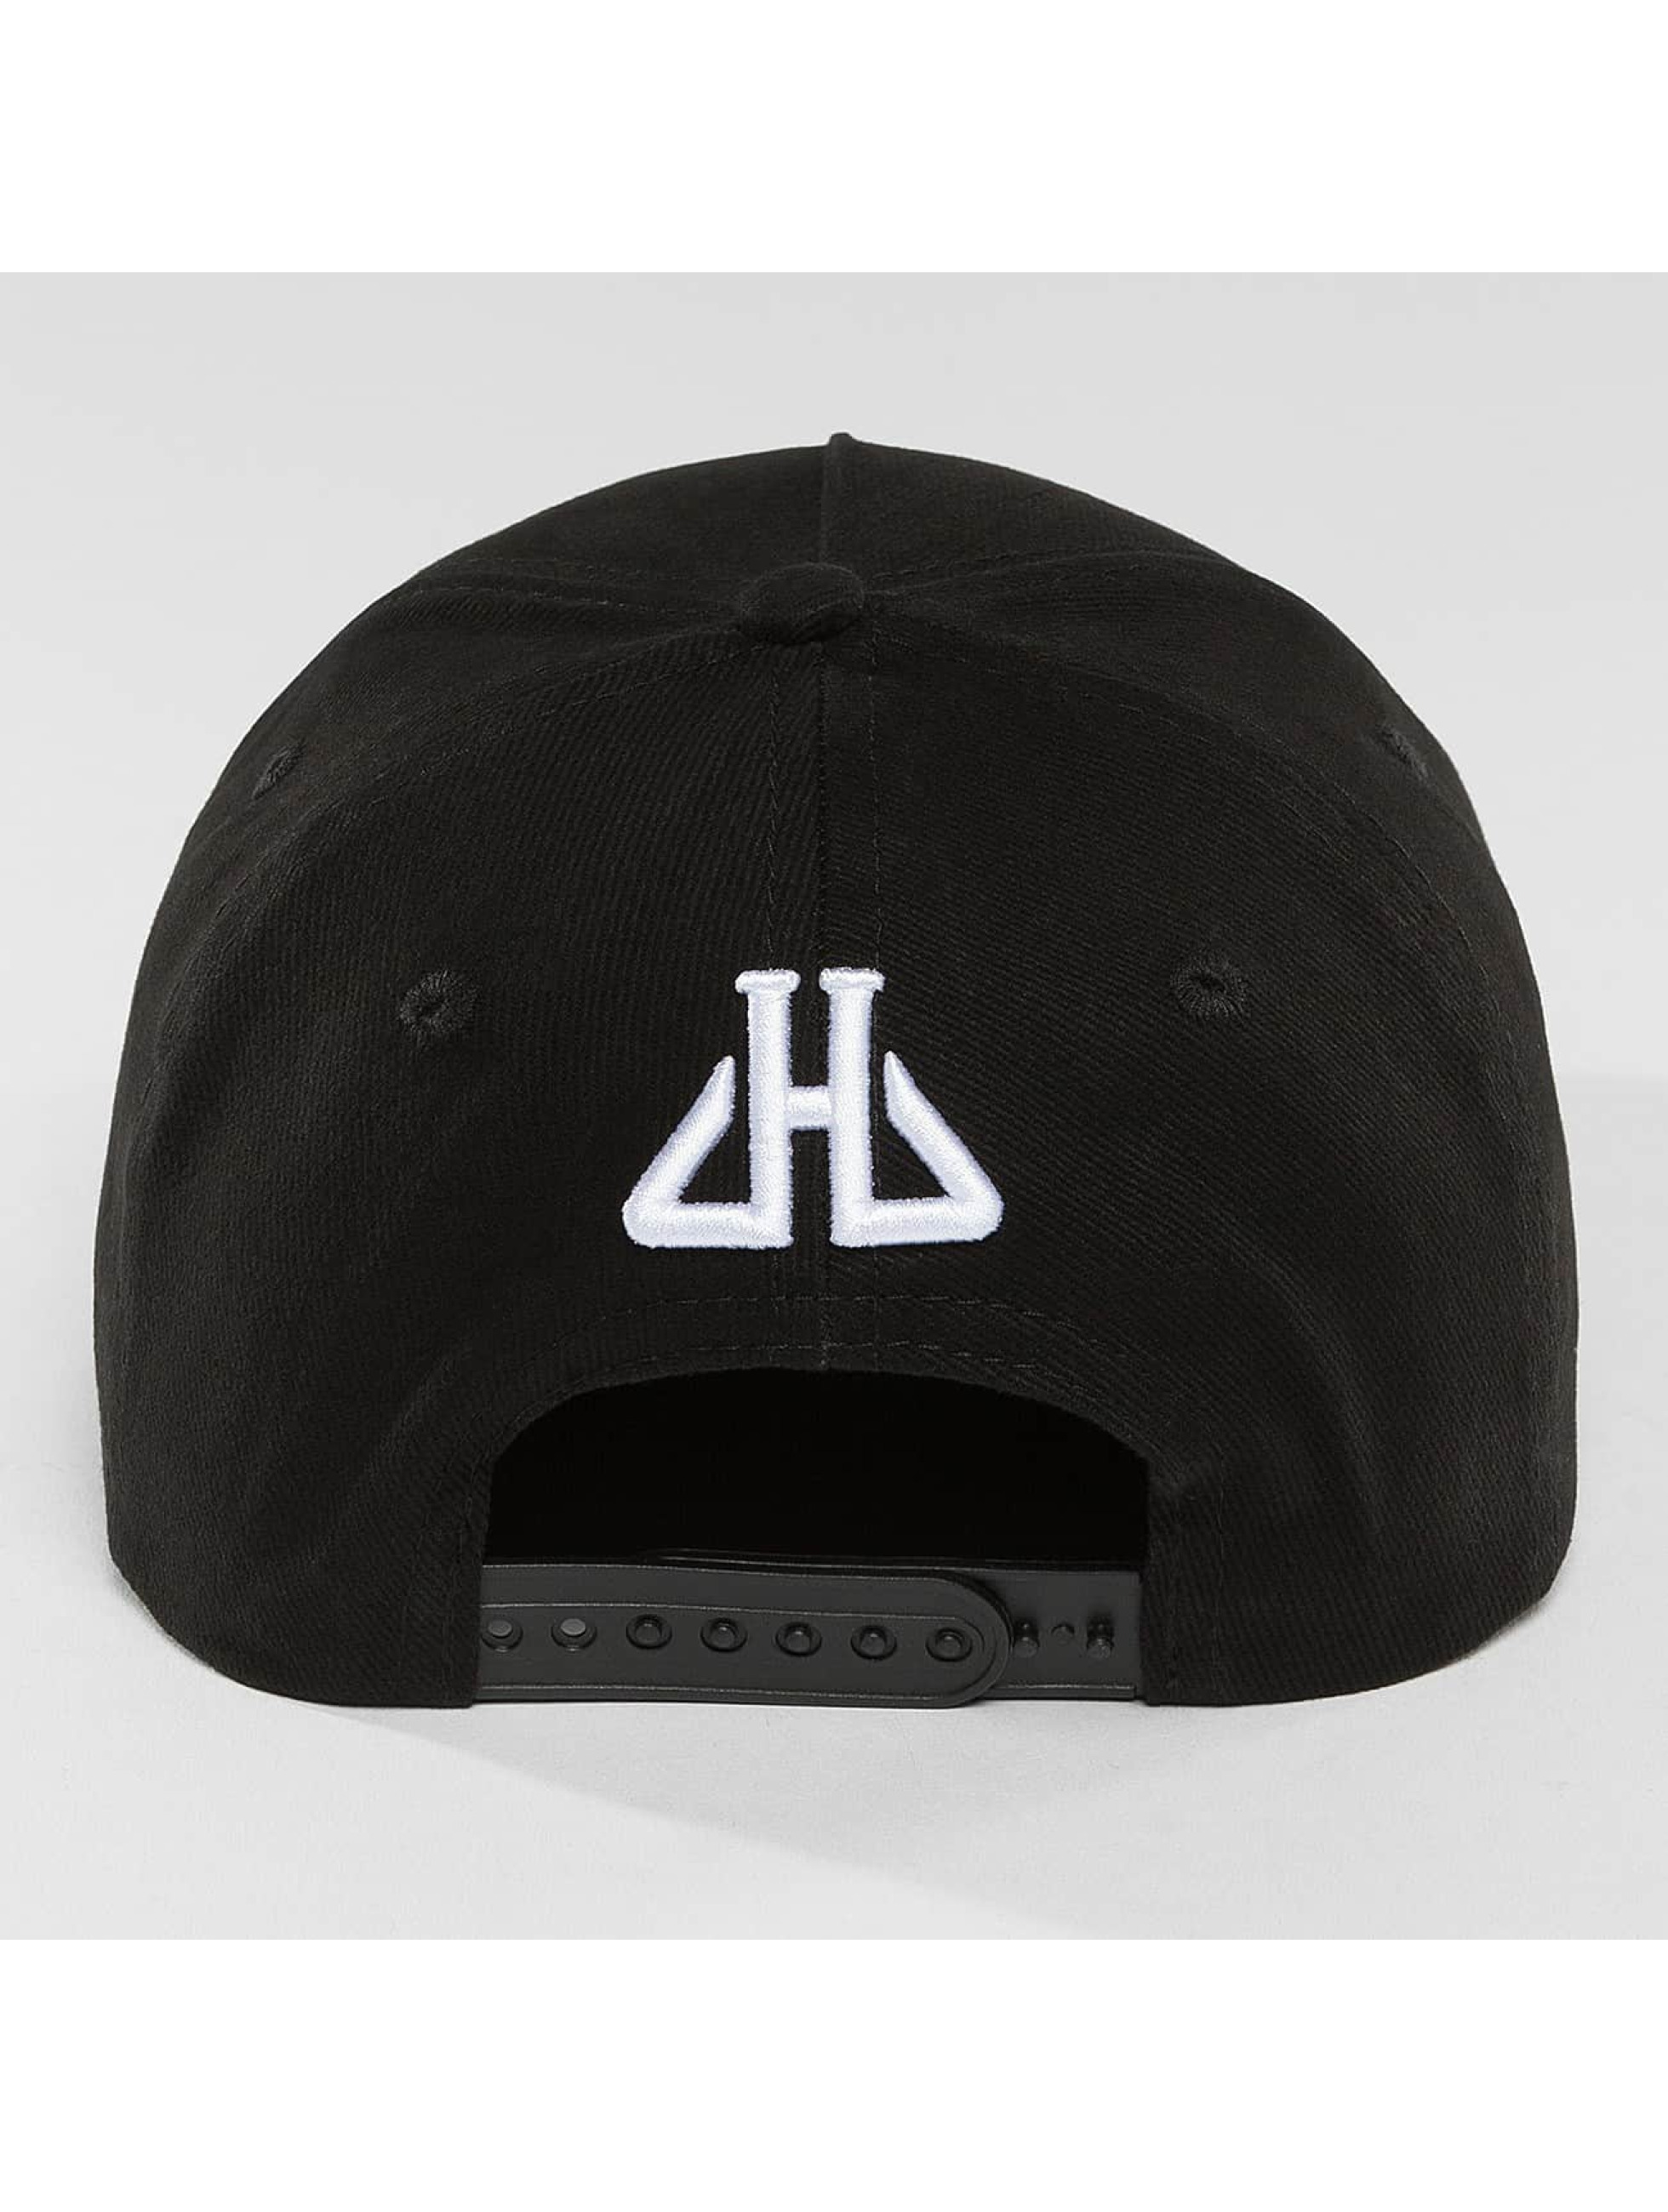 Horspist Snapback Caps Remenber musta